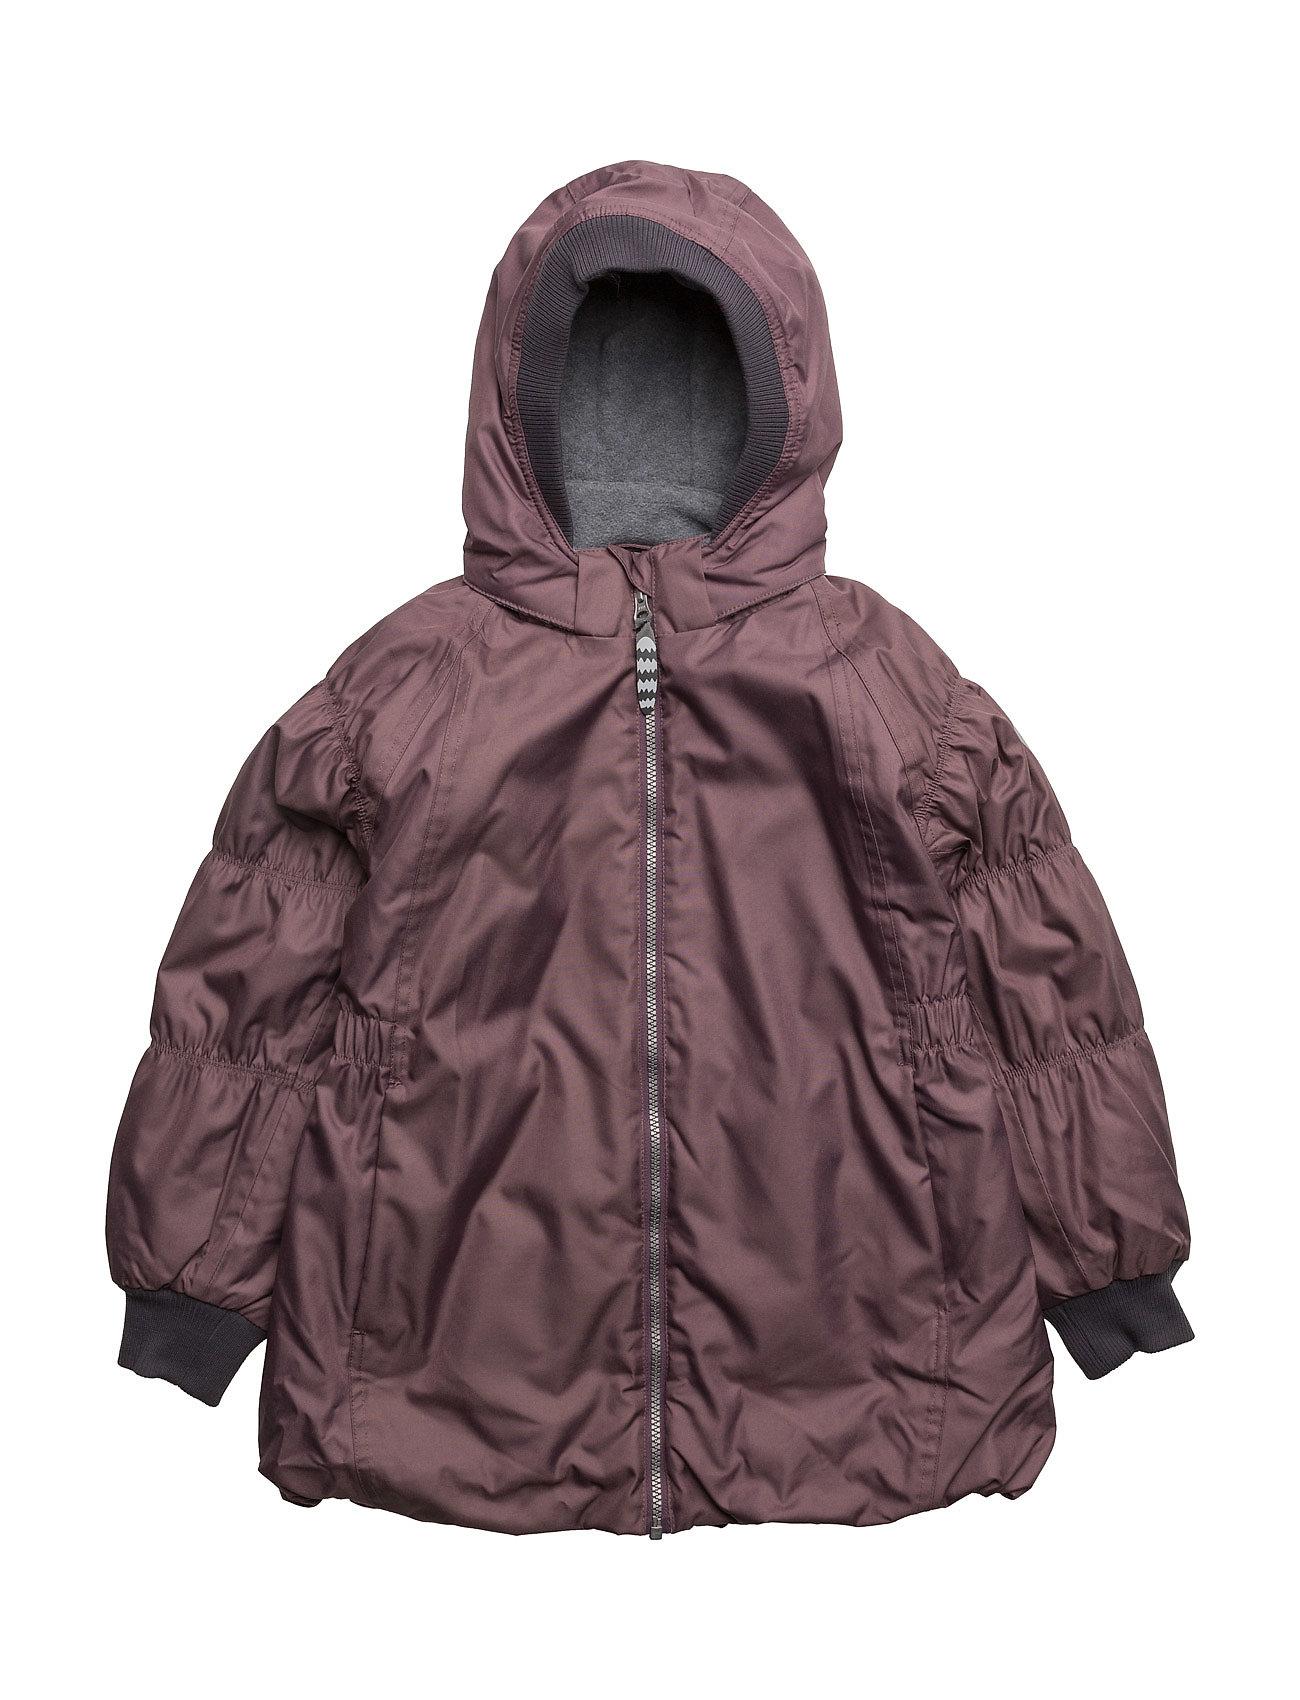 racoon outdoor – Cajsa solid jacket på boozt.com dk